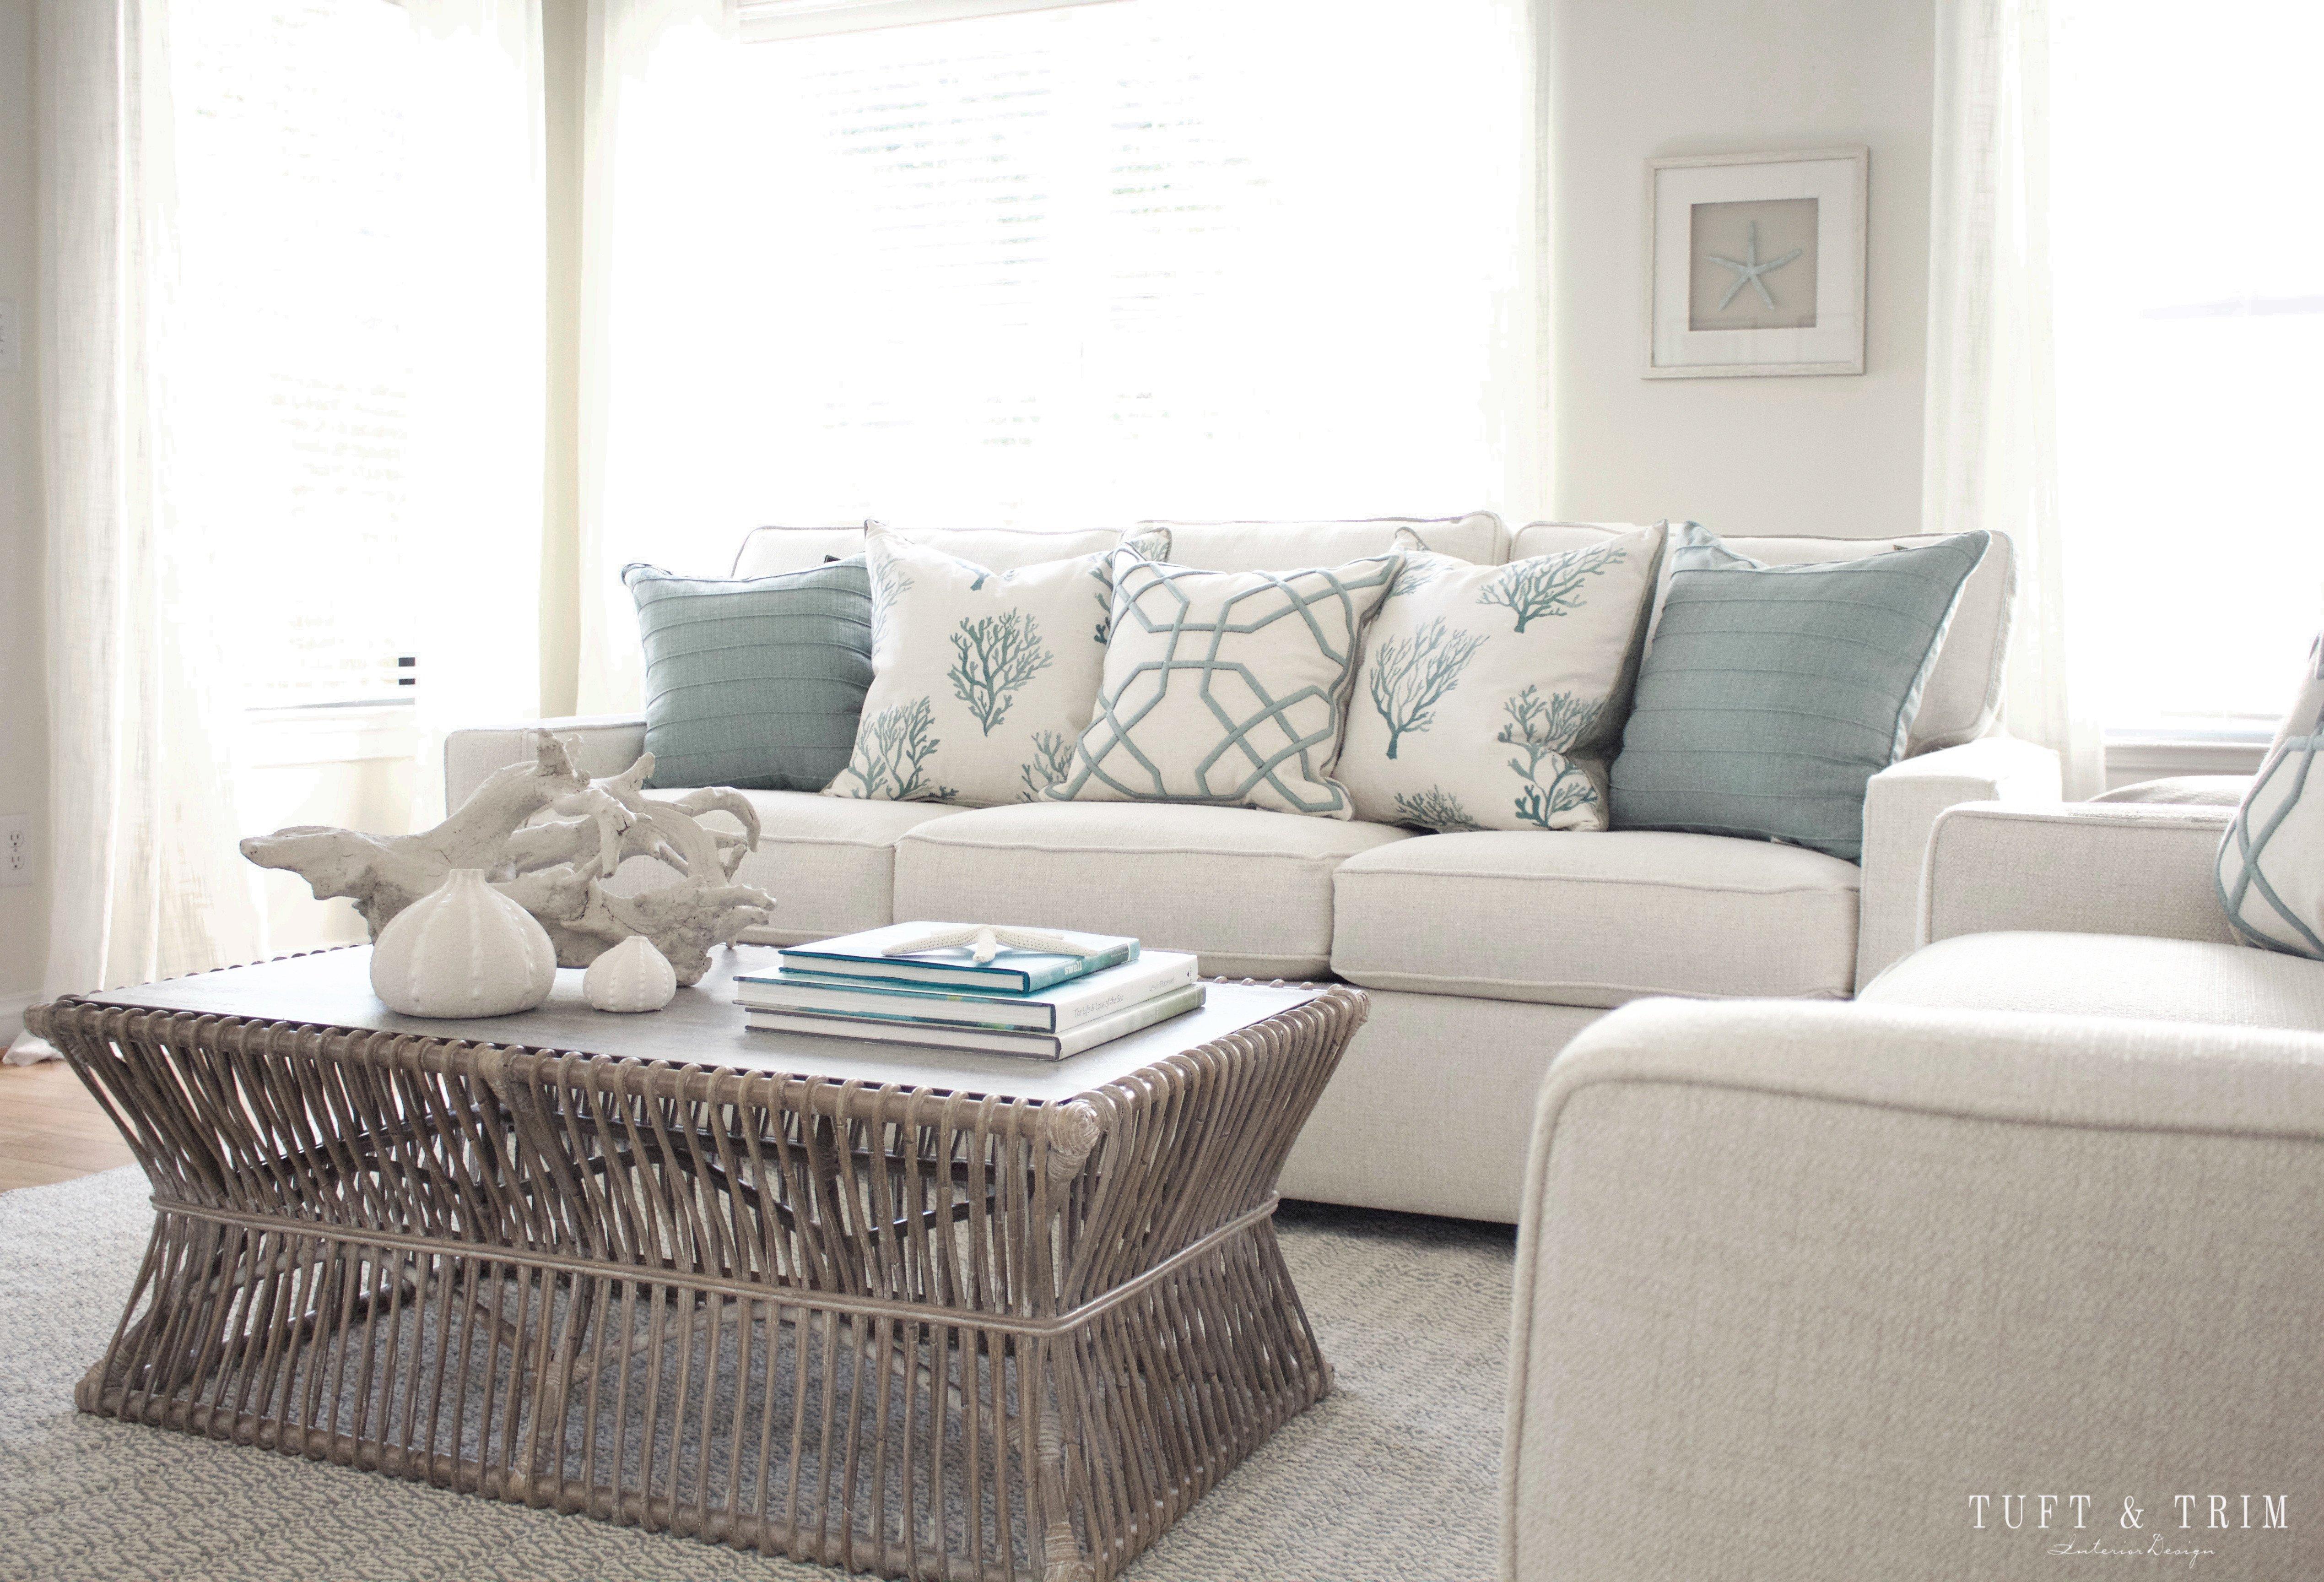 Coastal Contemporary Living Room Lovely Coastal Contemporary Living Room Reveal Tuft & Trim